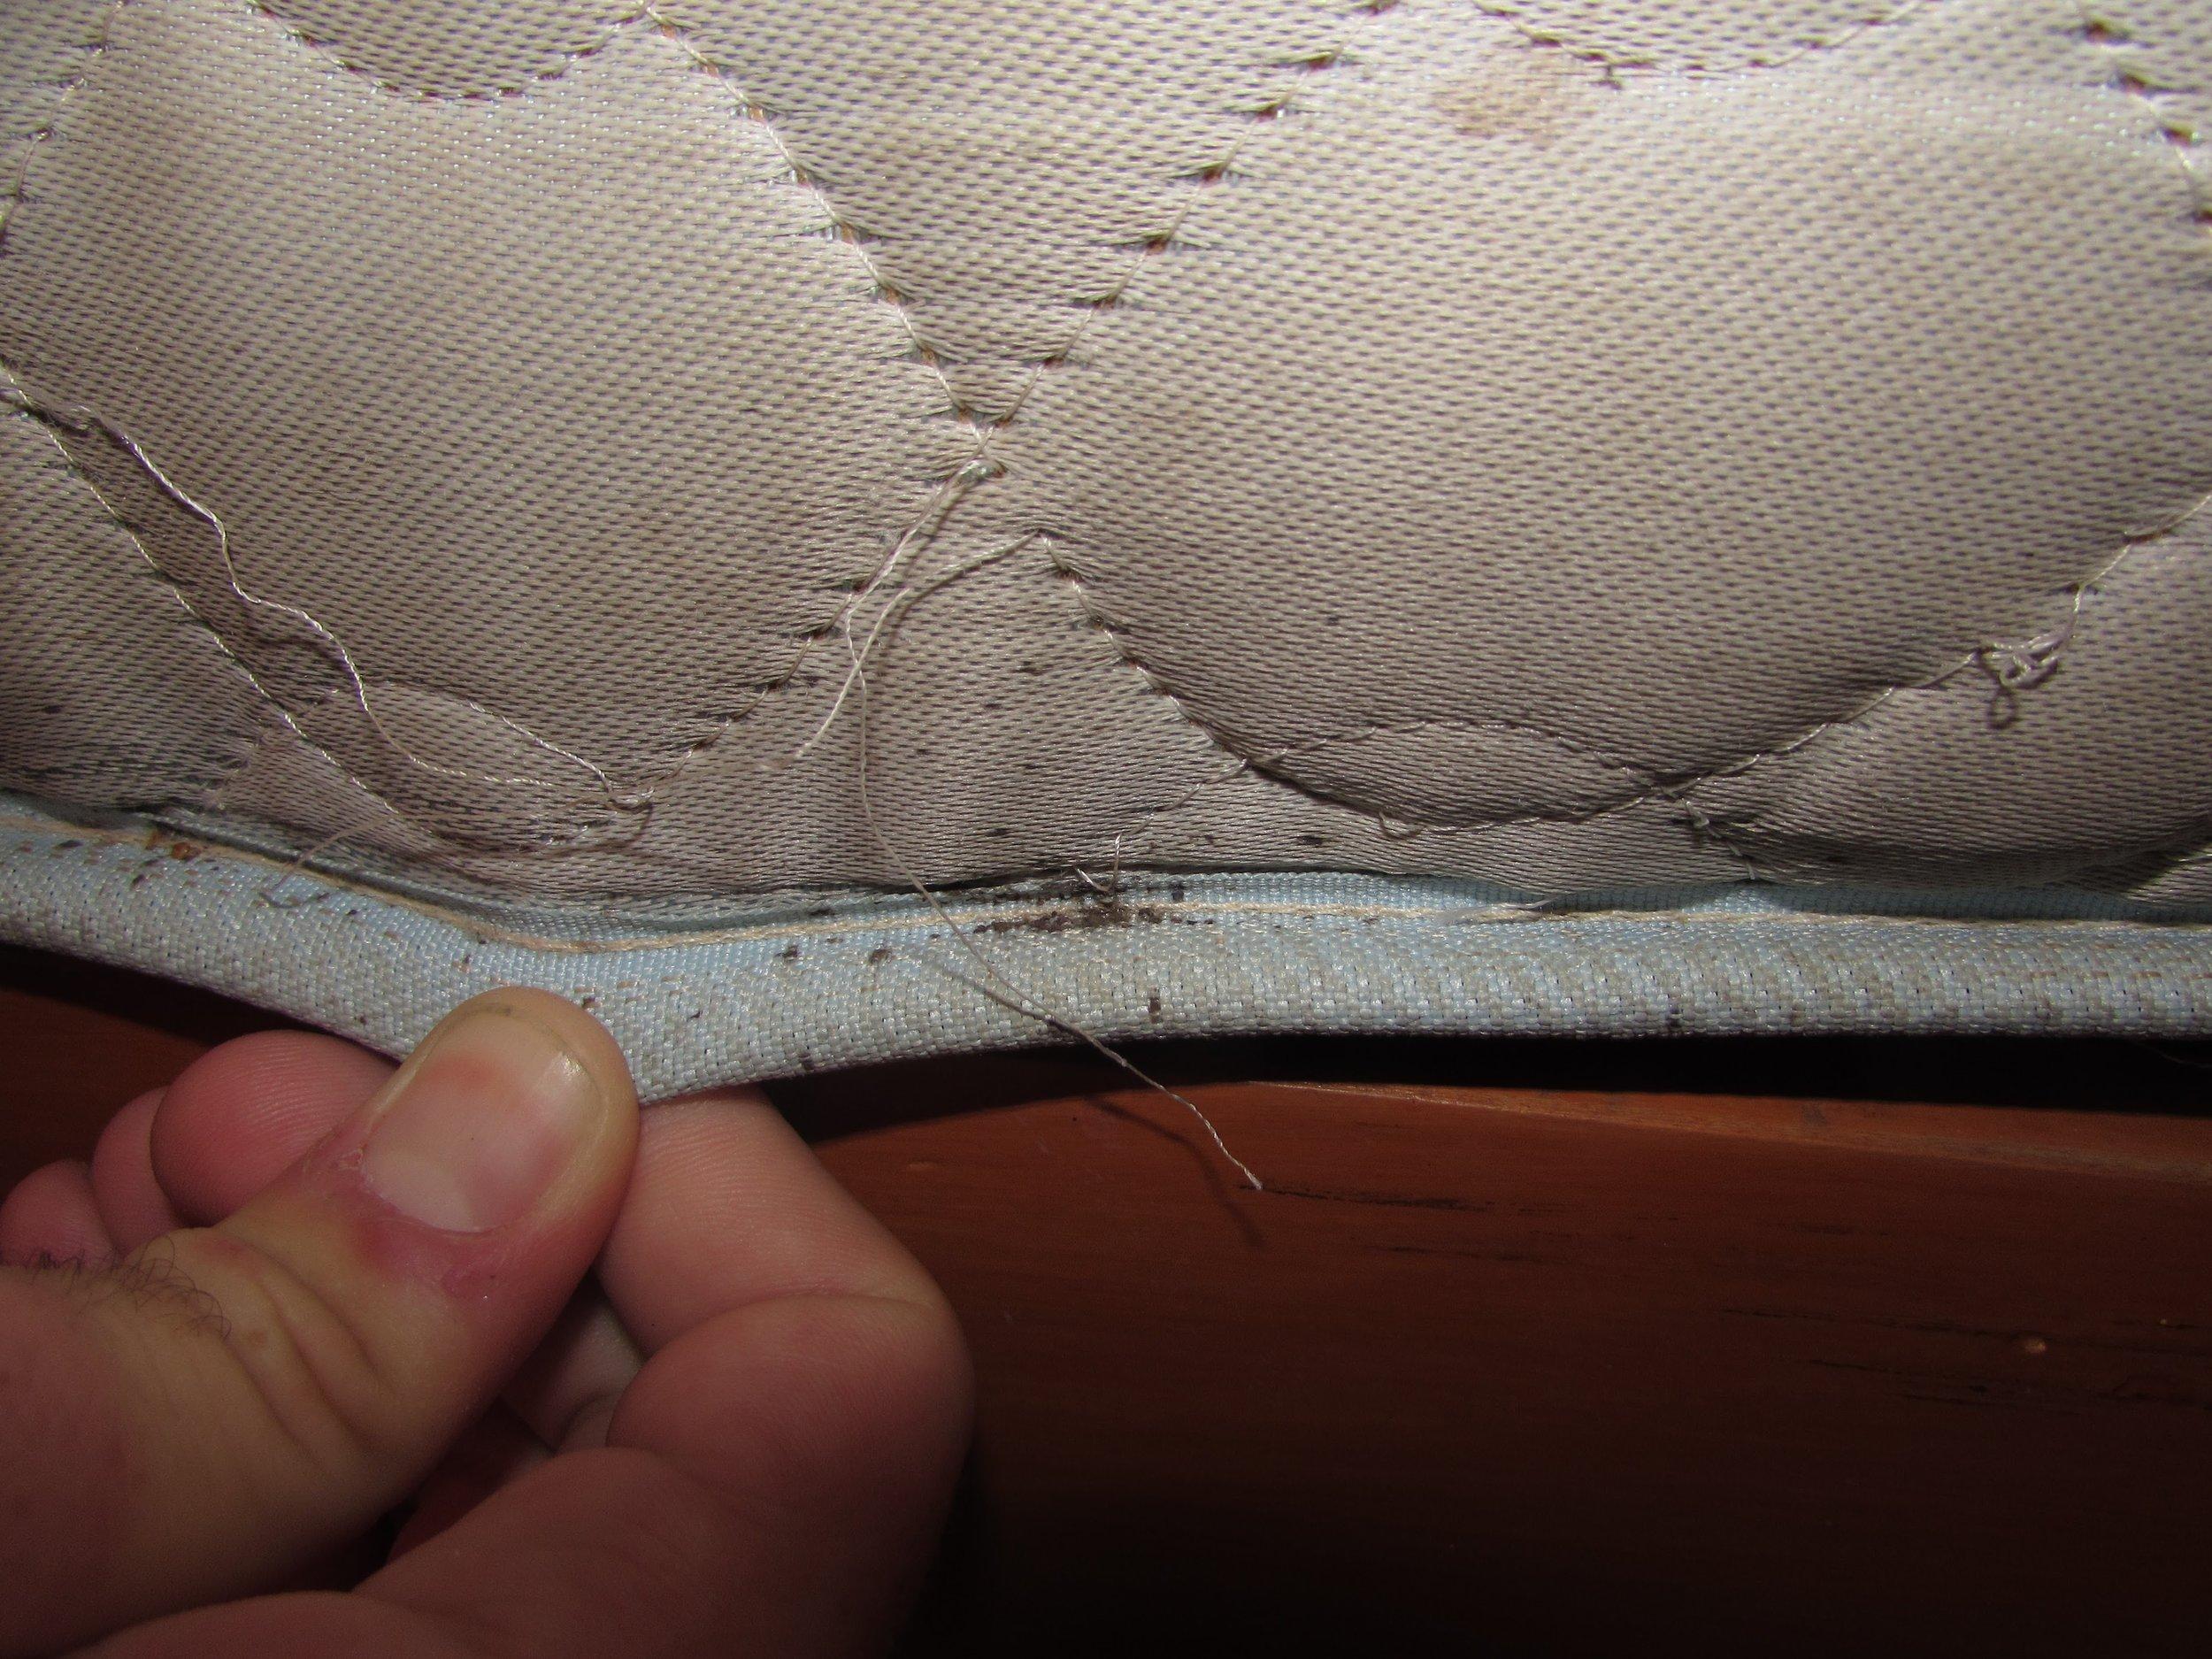 Bed bug poo on our mattress in Nadi, Fiji.